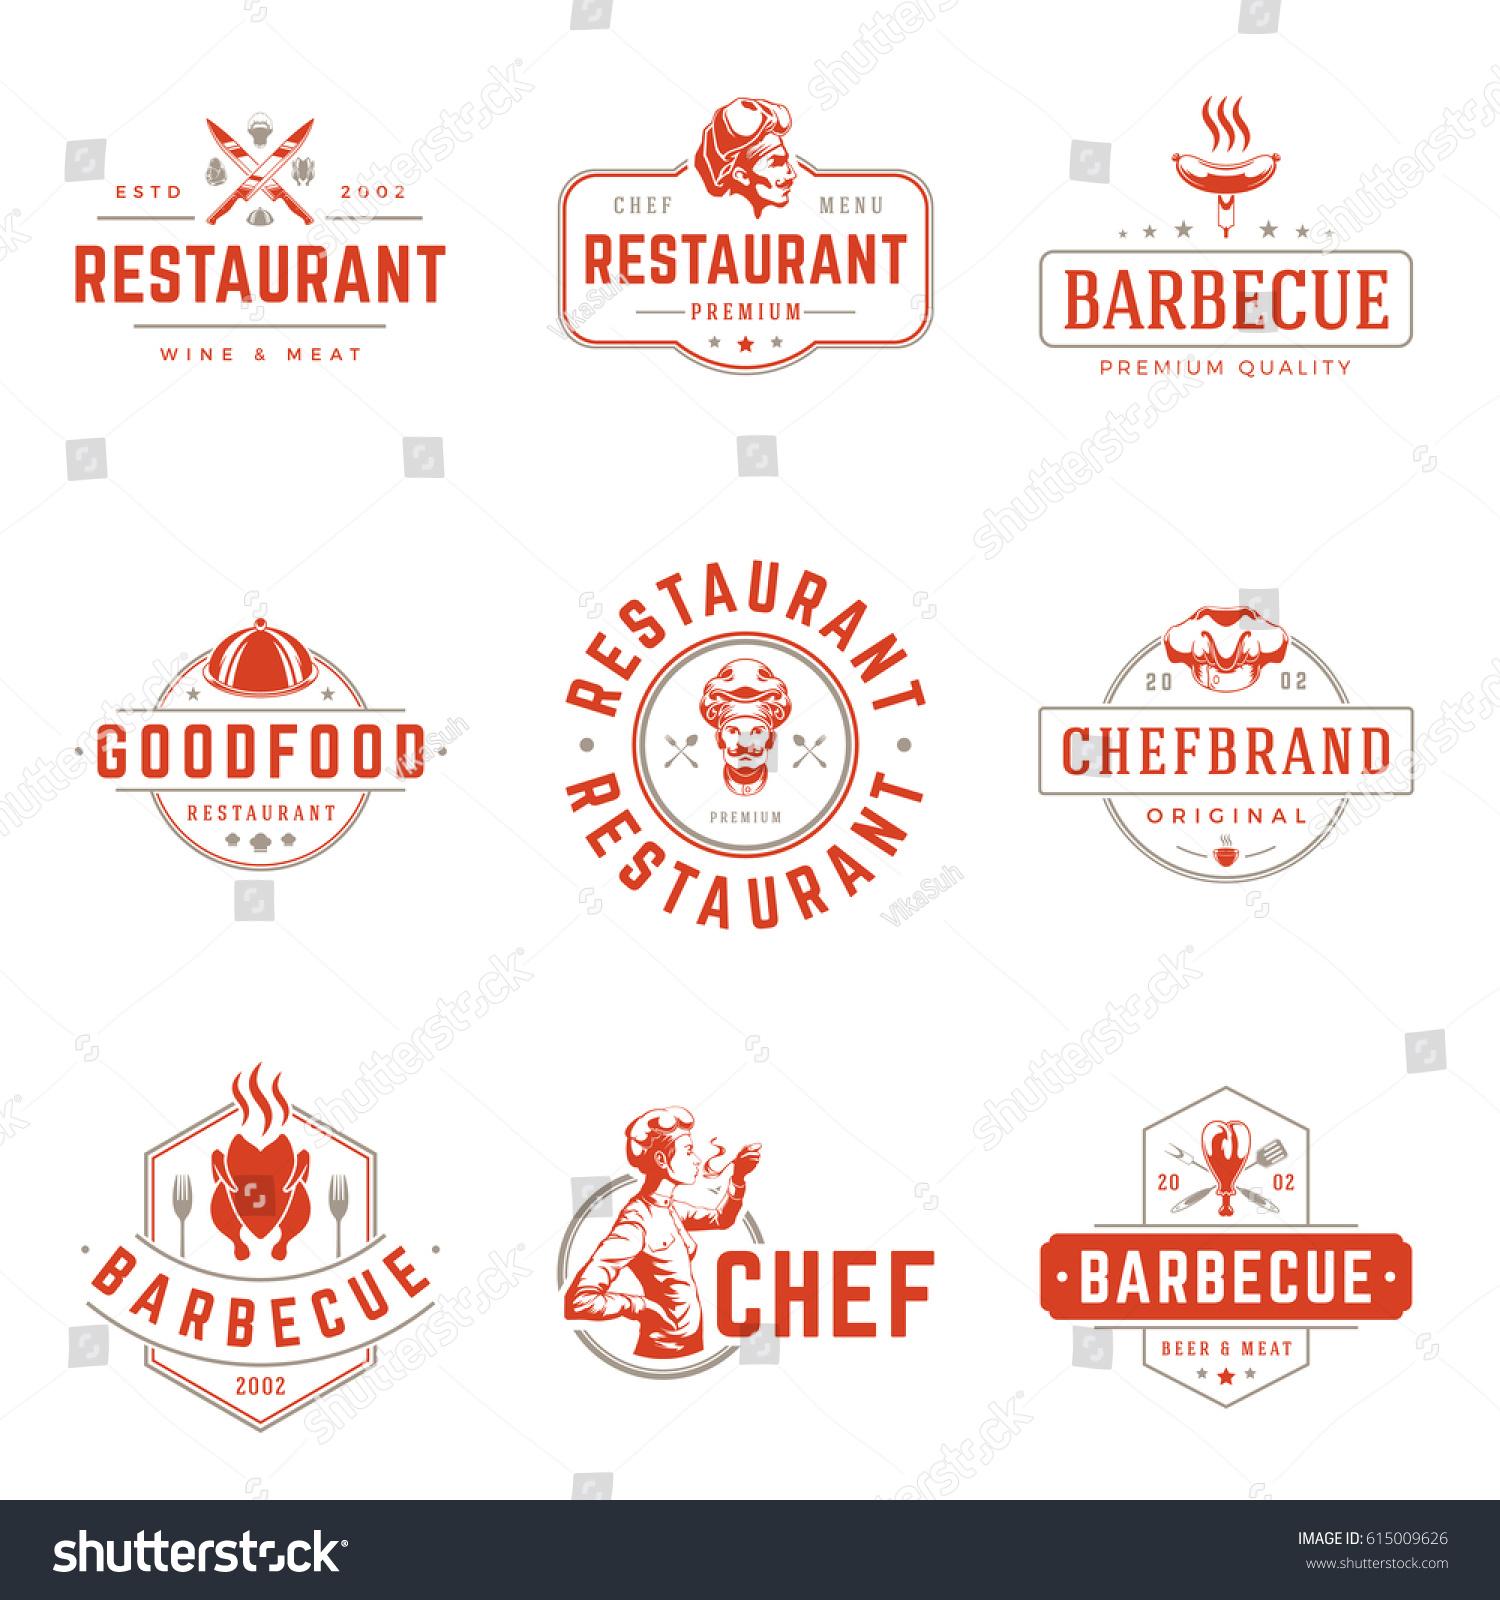 Restaurant logos templates vector objects set stock